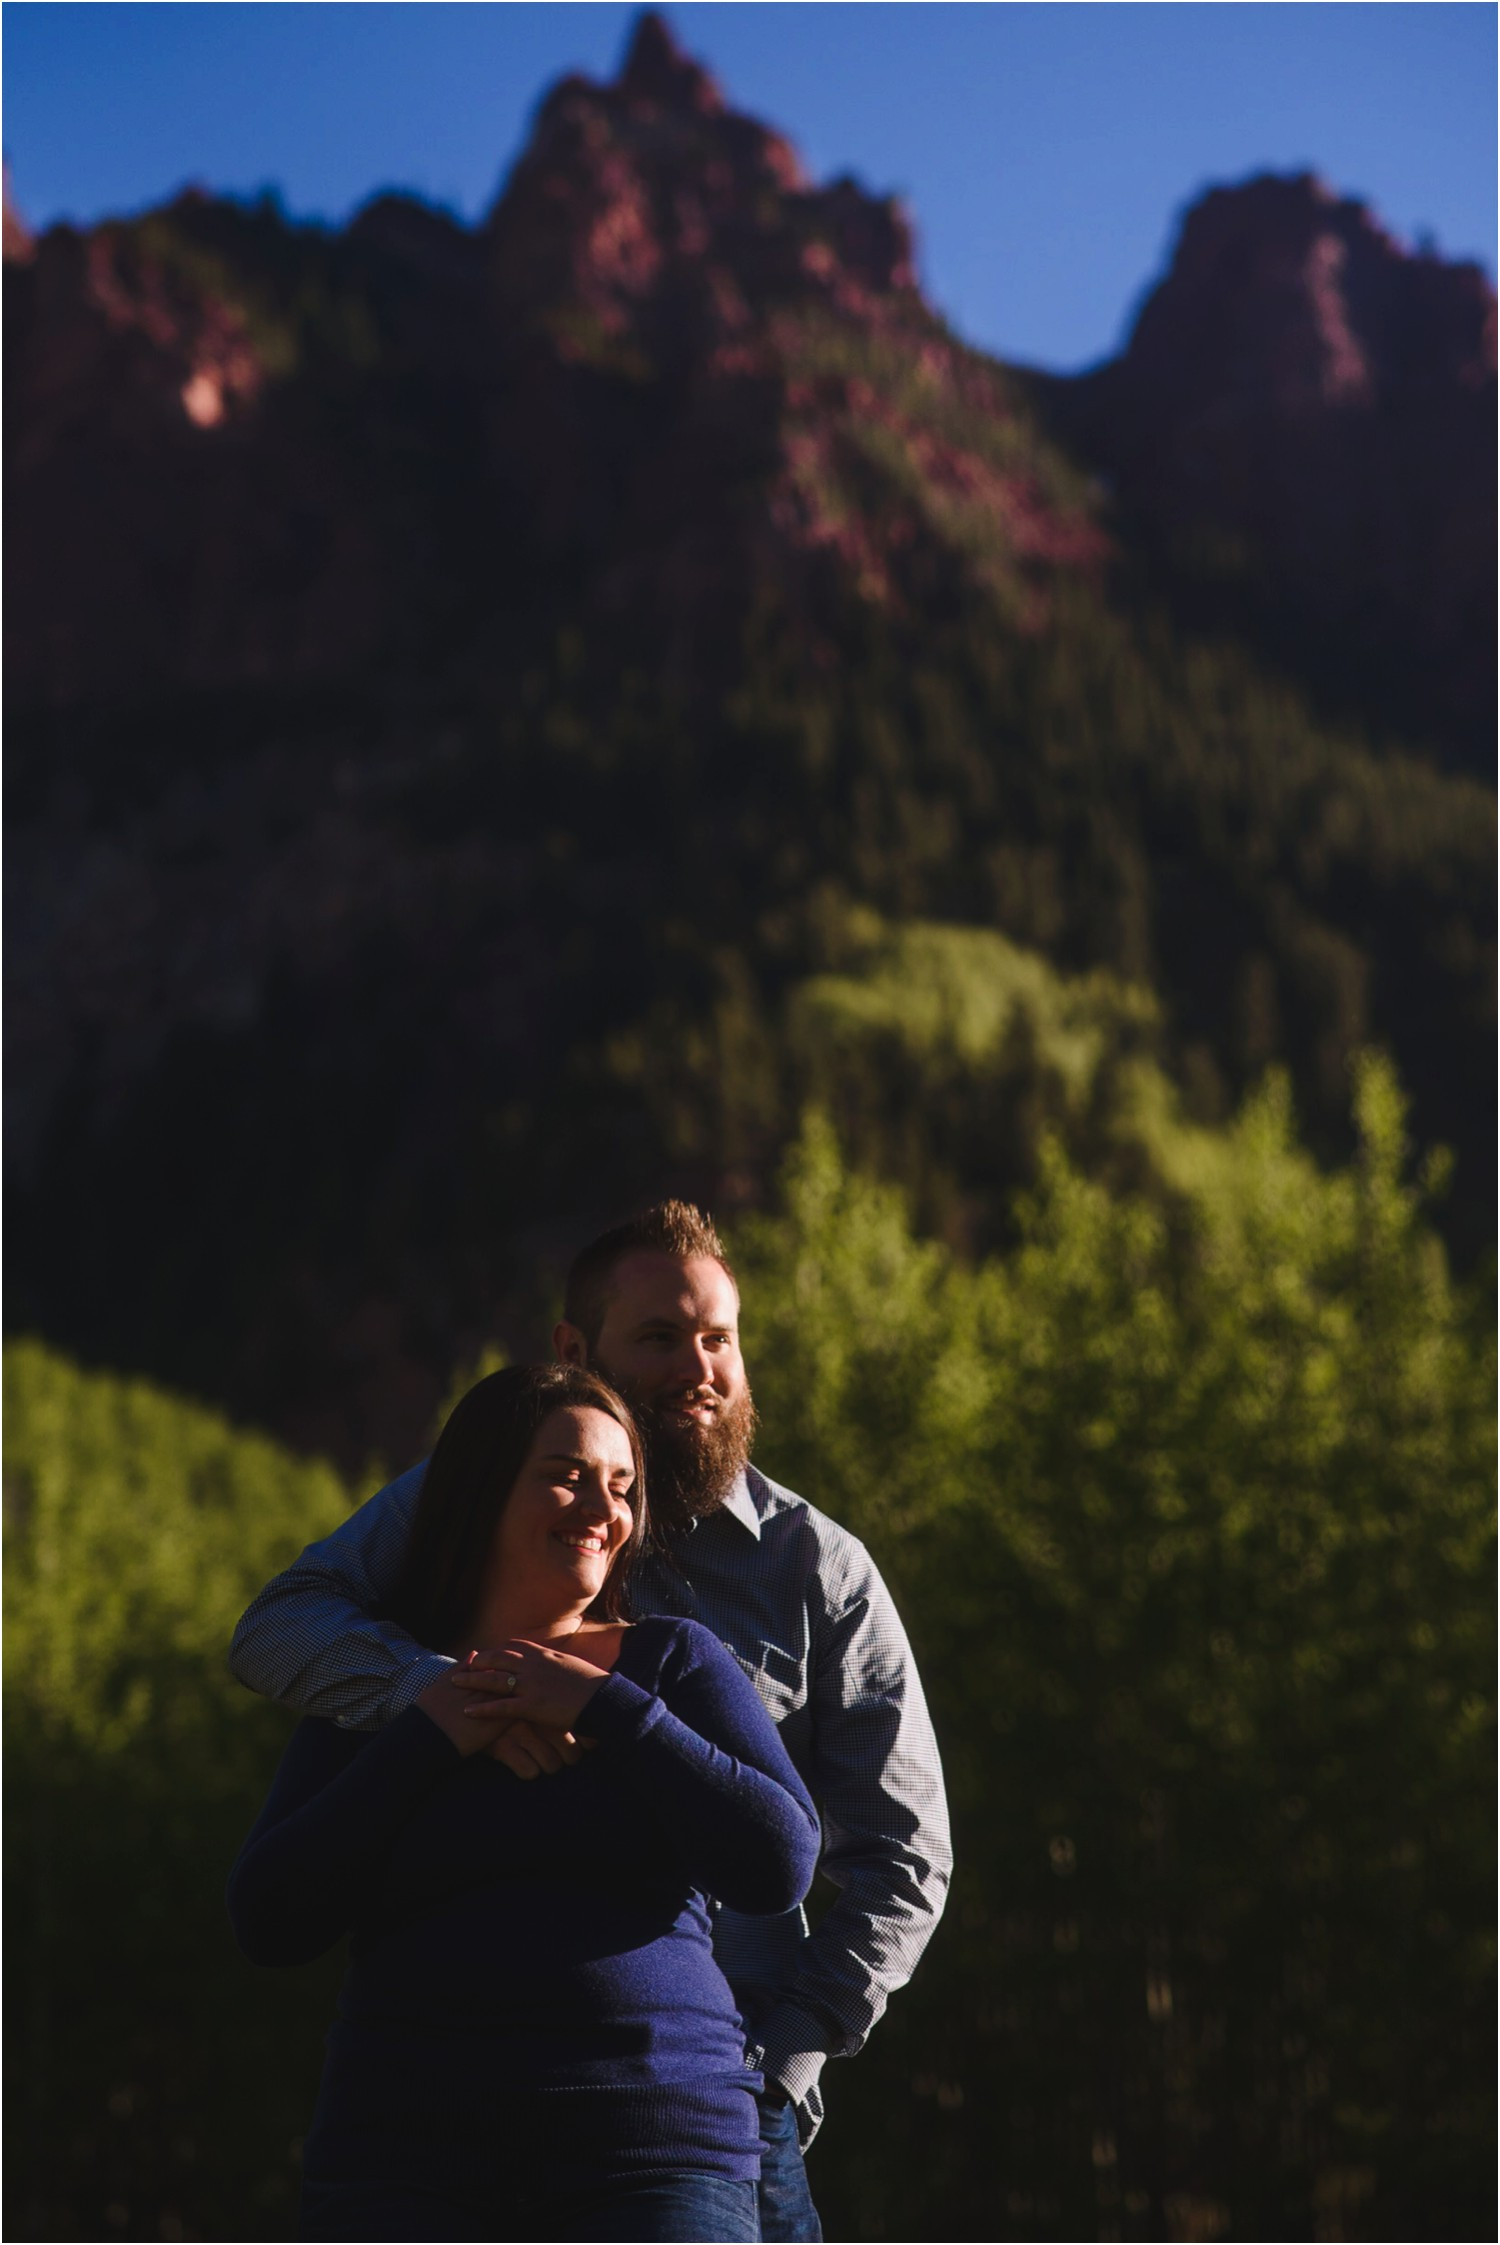 MAroon-Bells-Spring-Sunrise-engagement-photography_0019.jpg